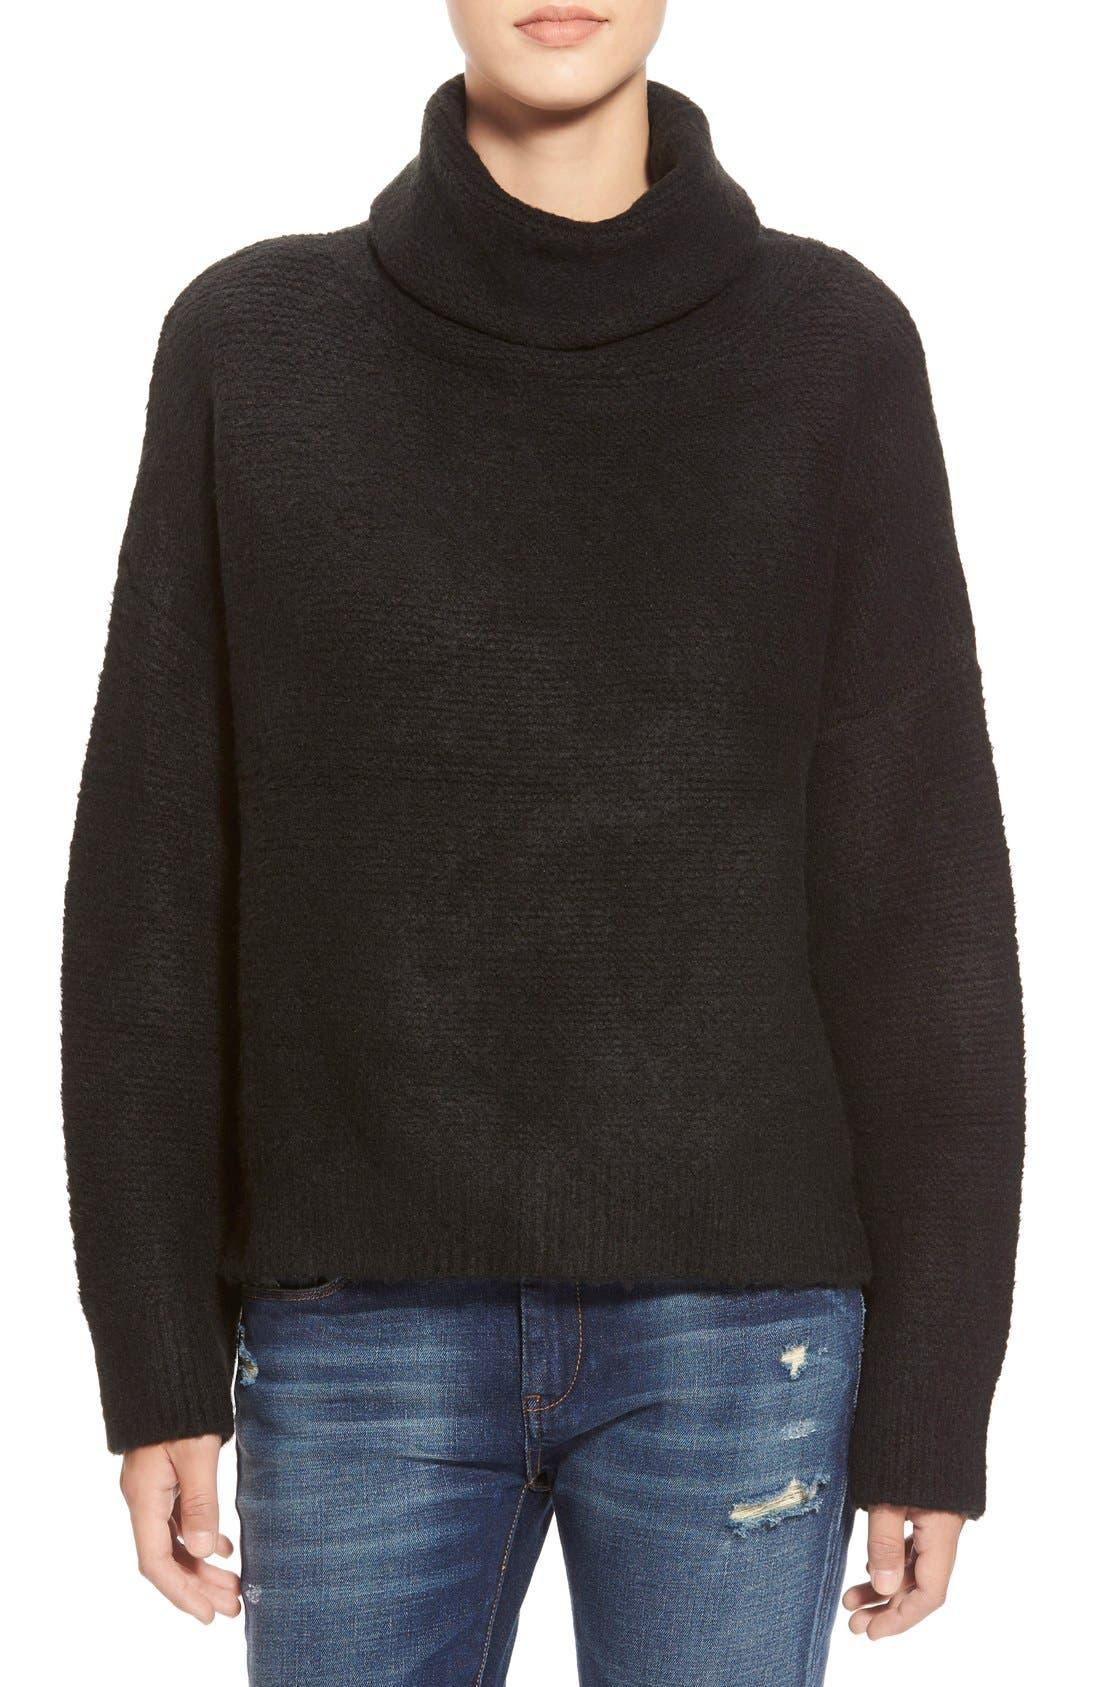 Boxy Turtleneck Sweater,                             Main thumbnail 1, color,                             001